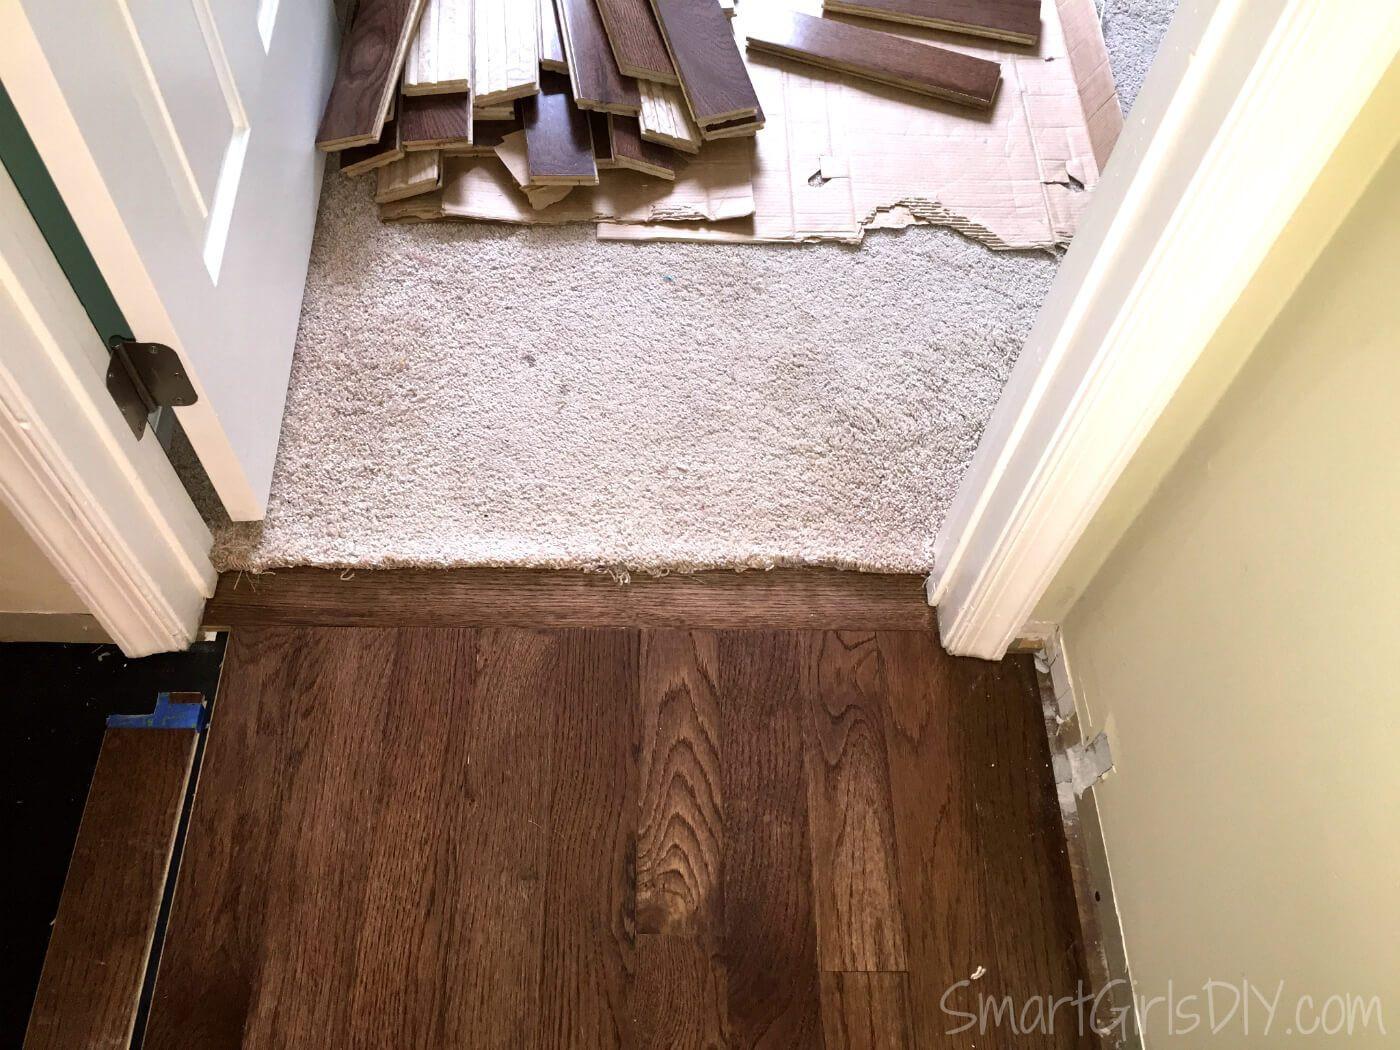 hardwood flooring per square foot of upstairs hallway 1 installing hardwood floors within transition between carpet and hardwood floor